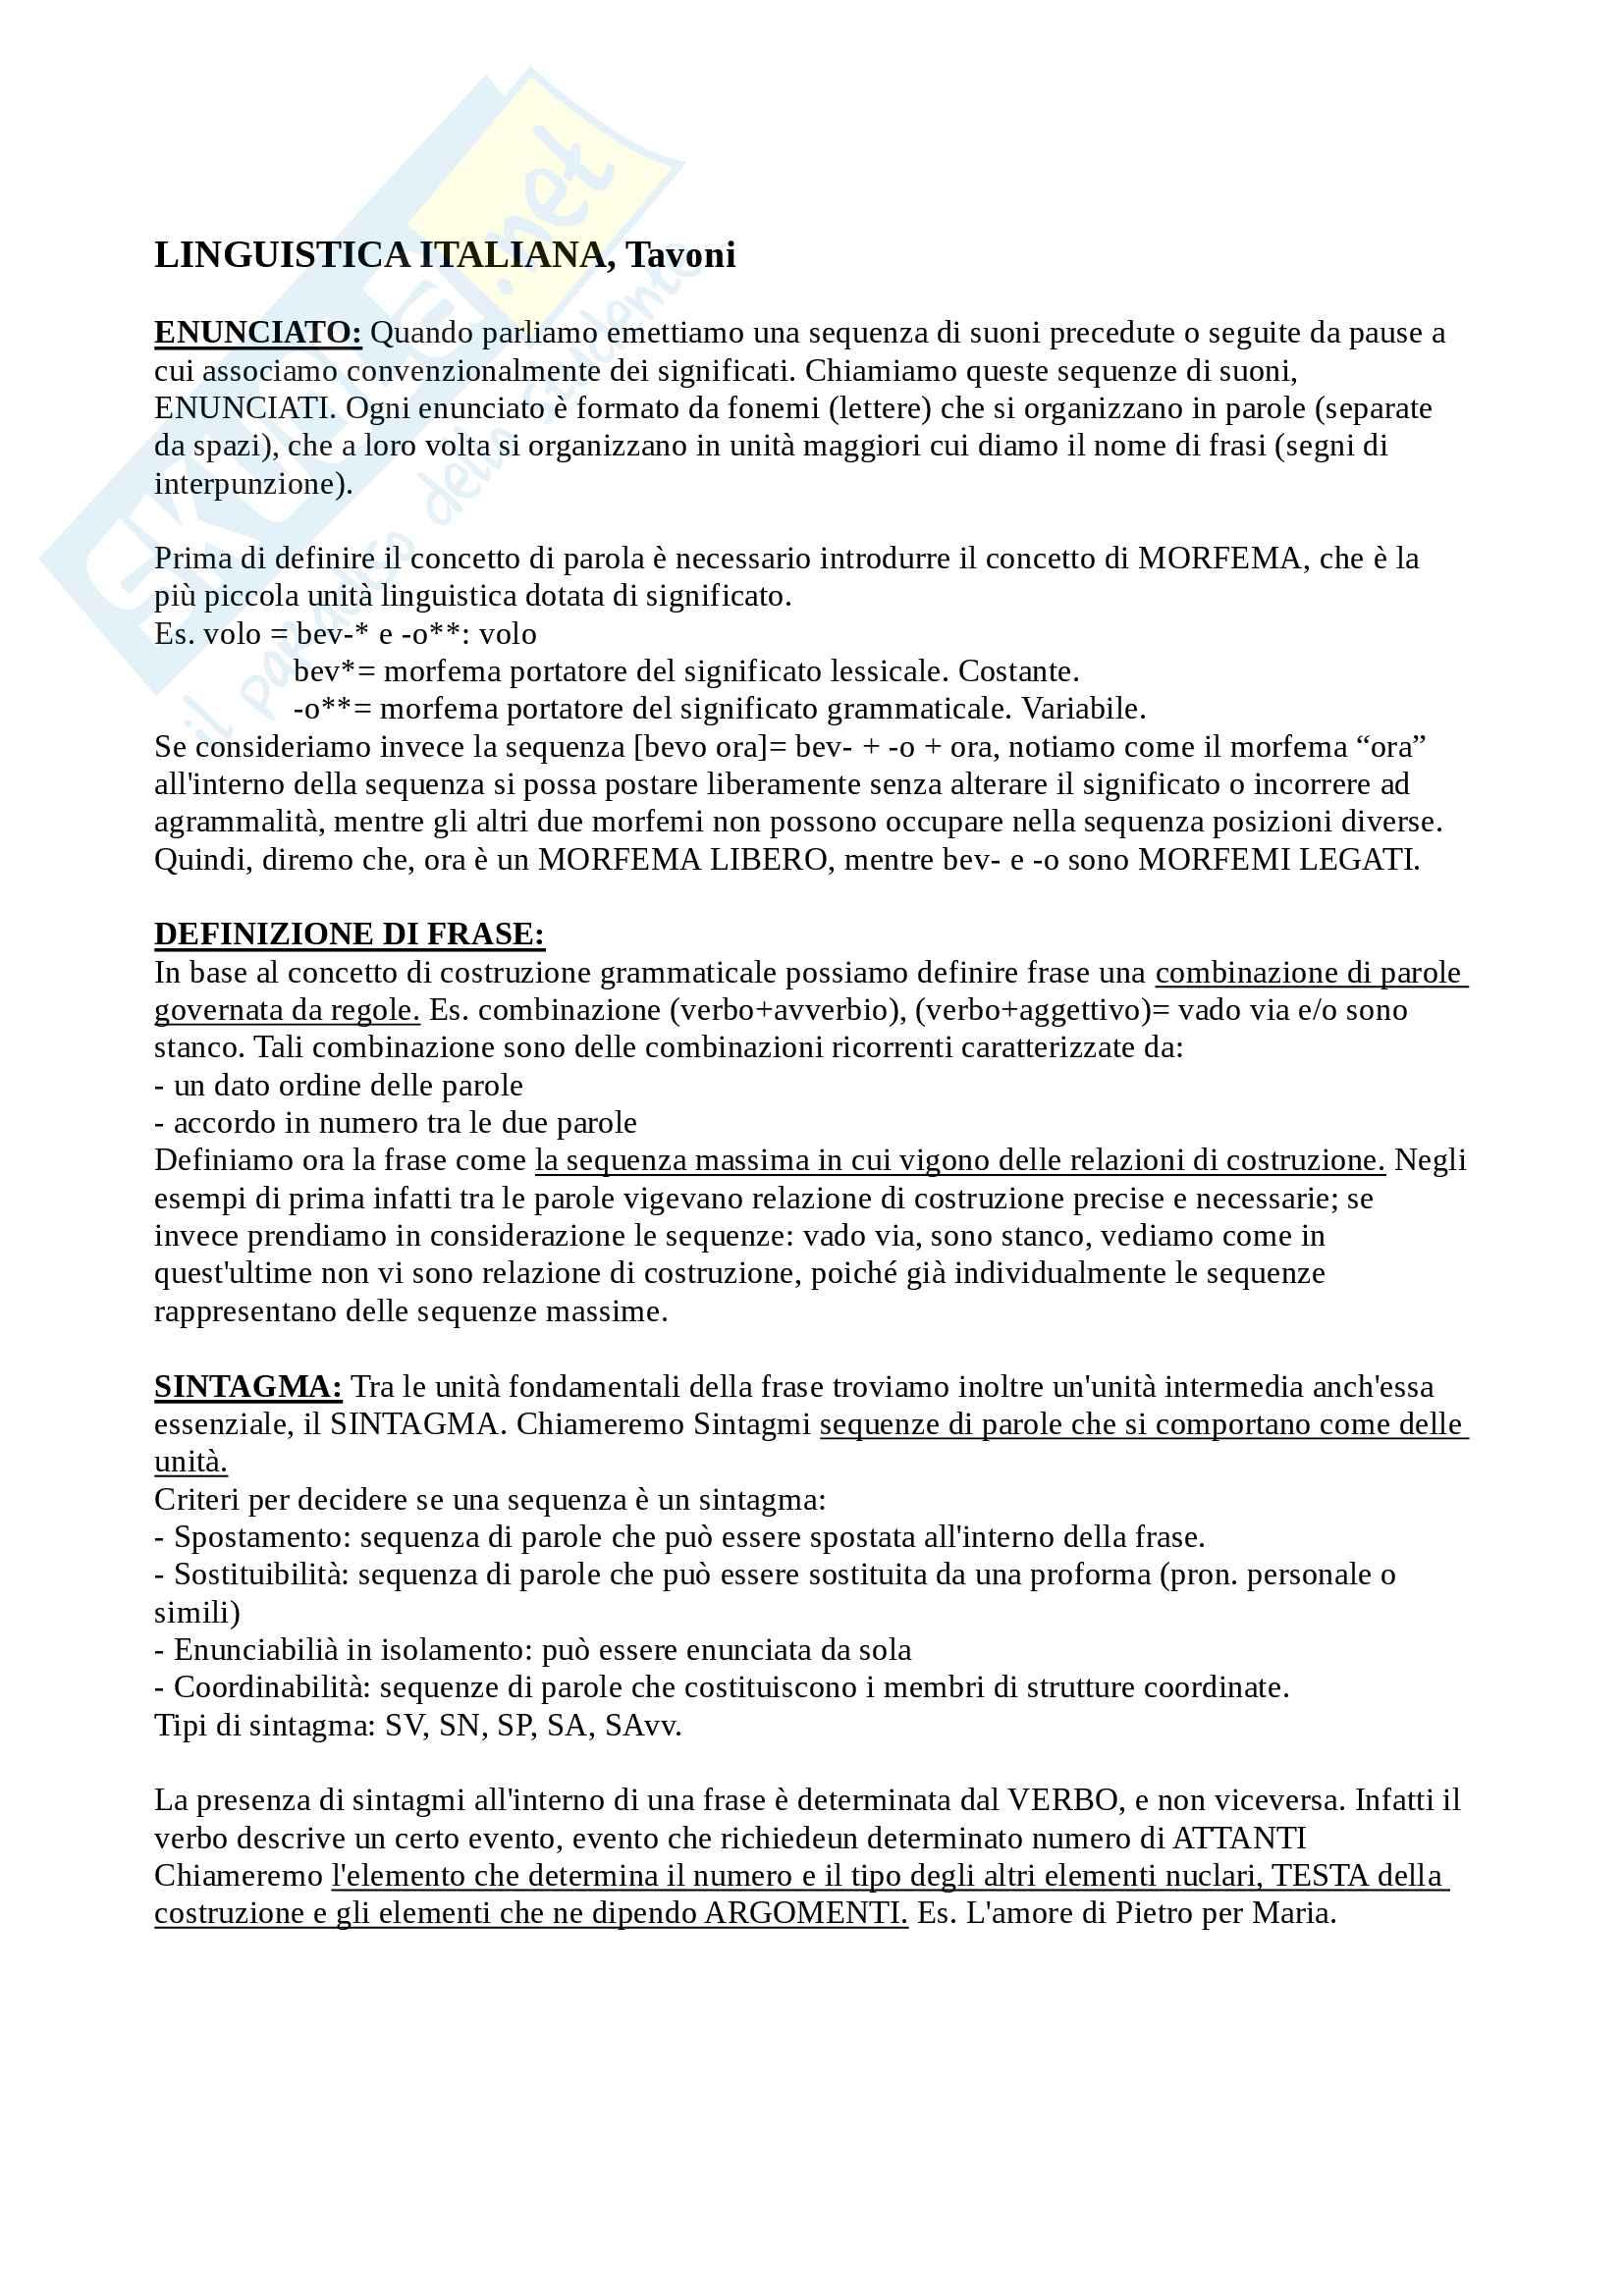 appunto M. Tavoni Linguistica italiana